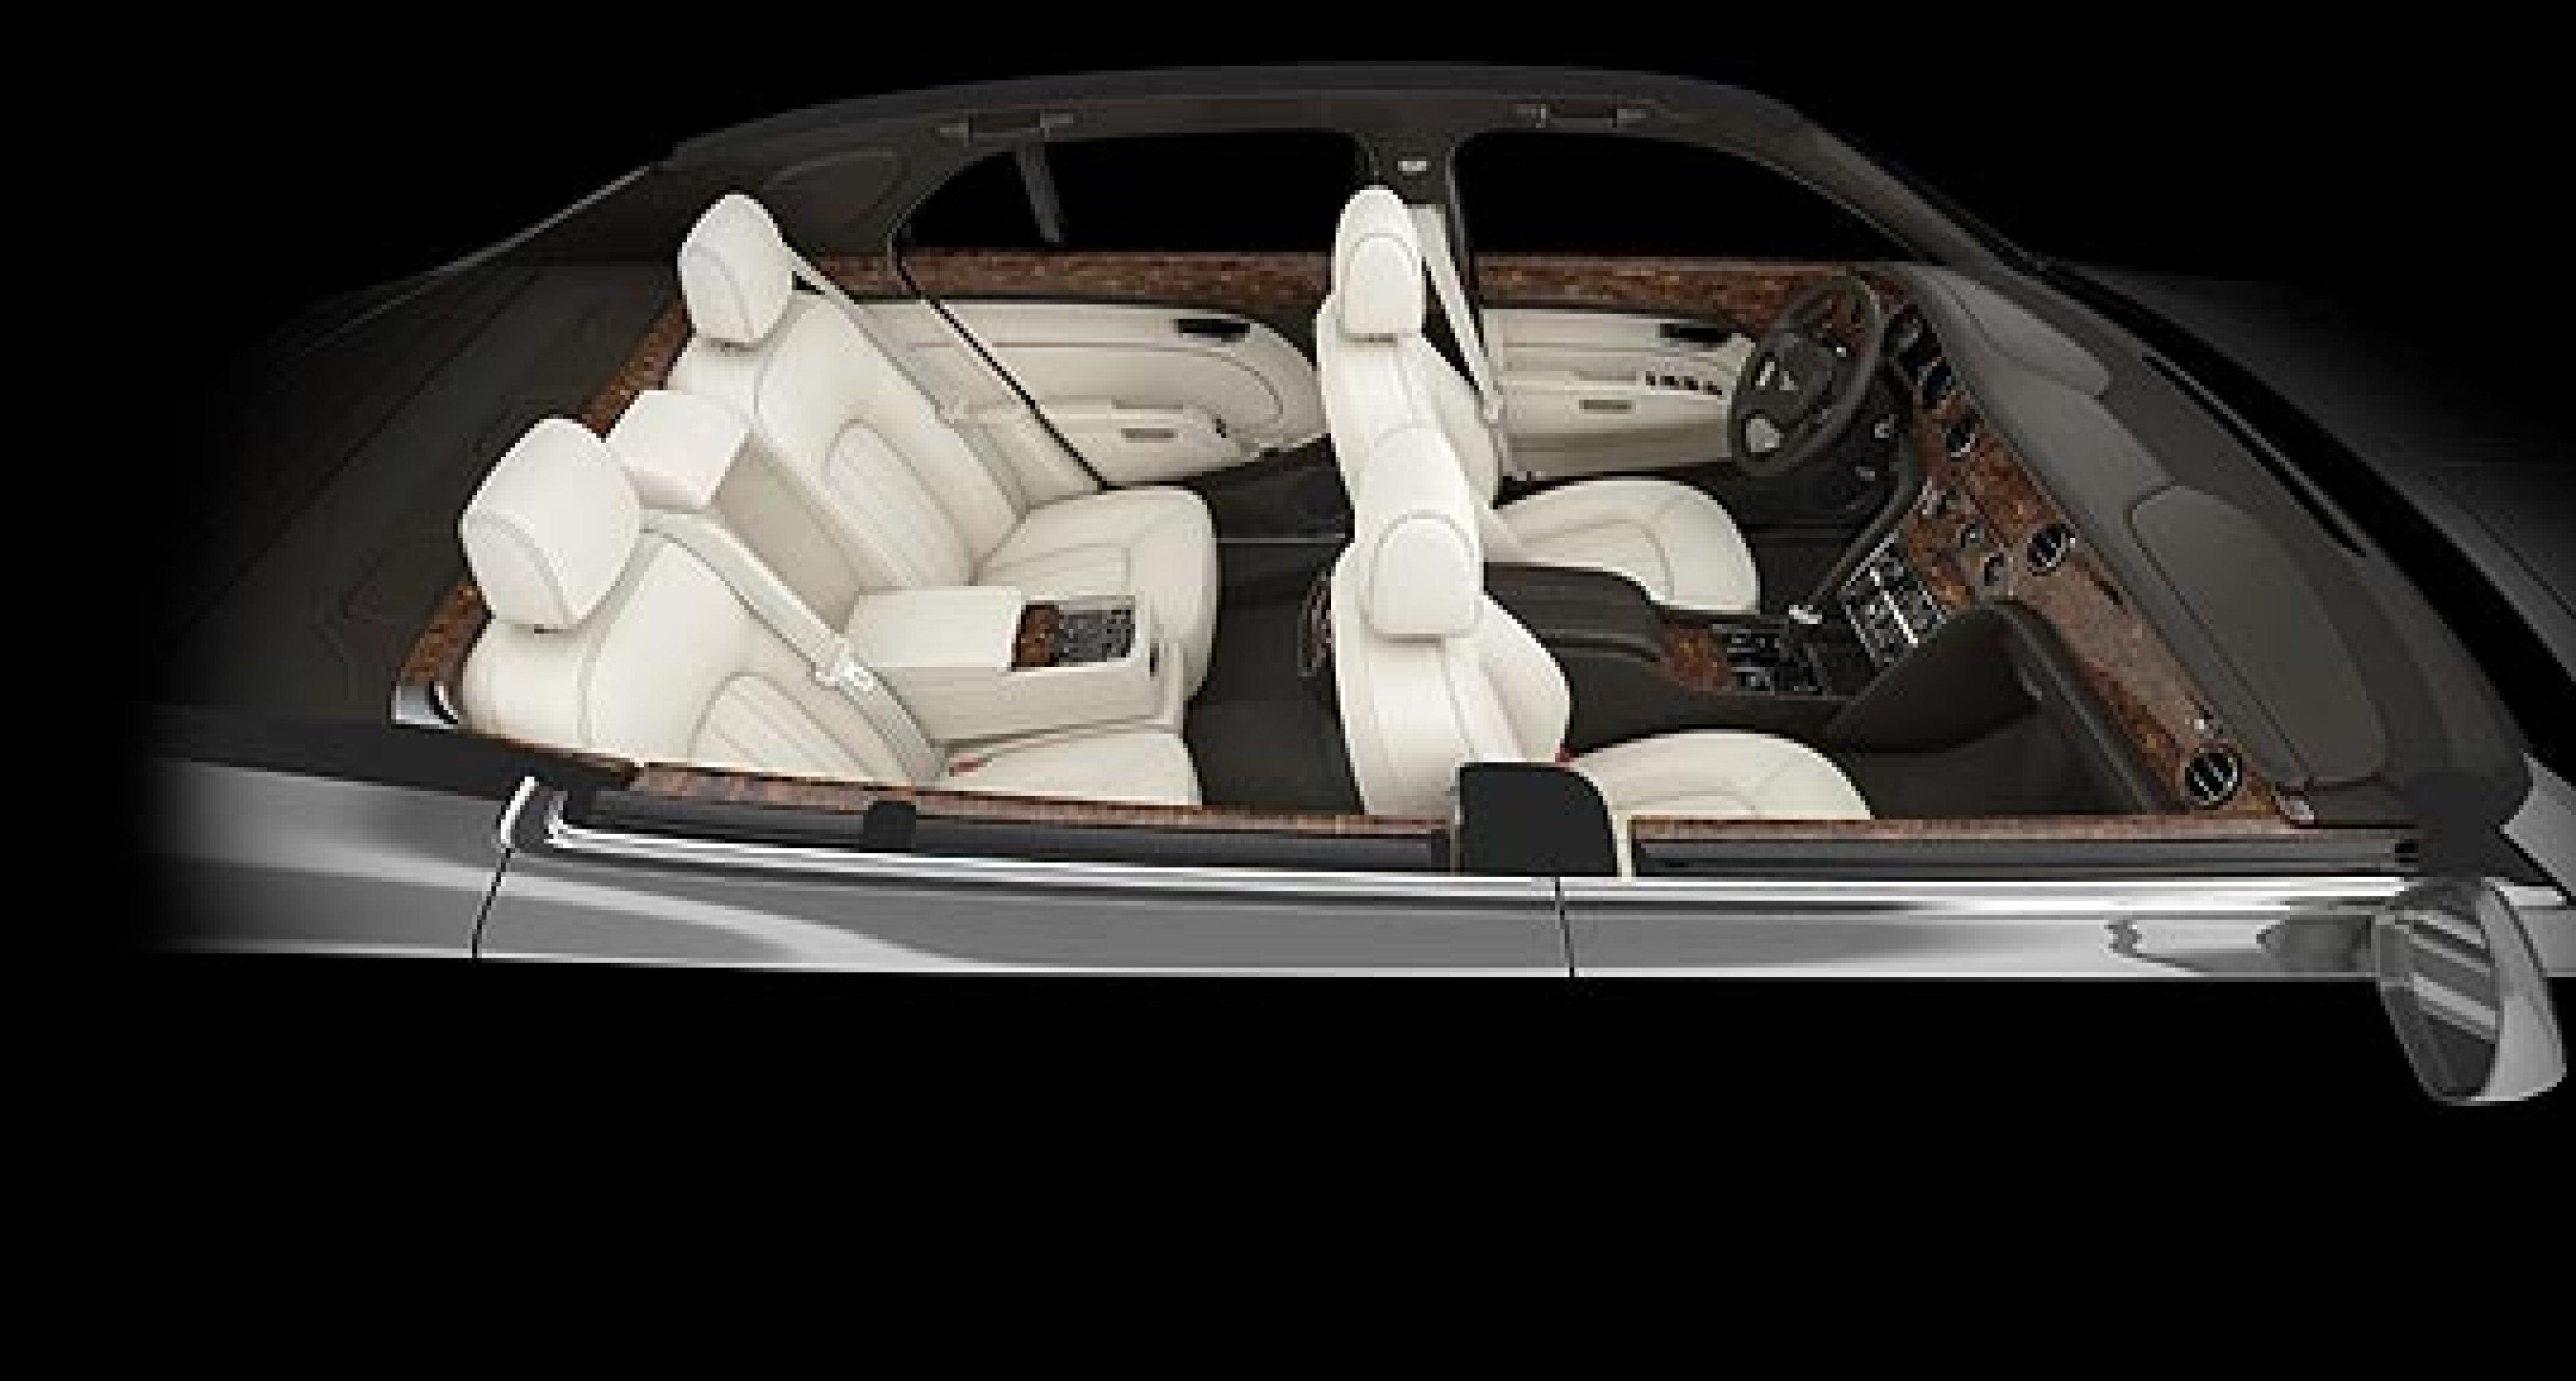 Bentley Mulsanne: Handcrafted Interior